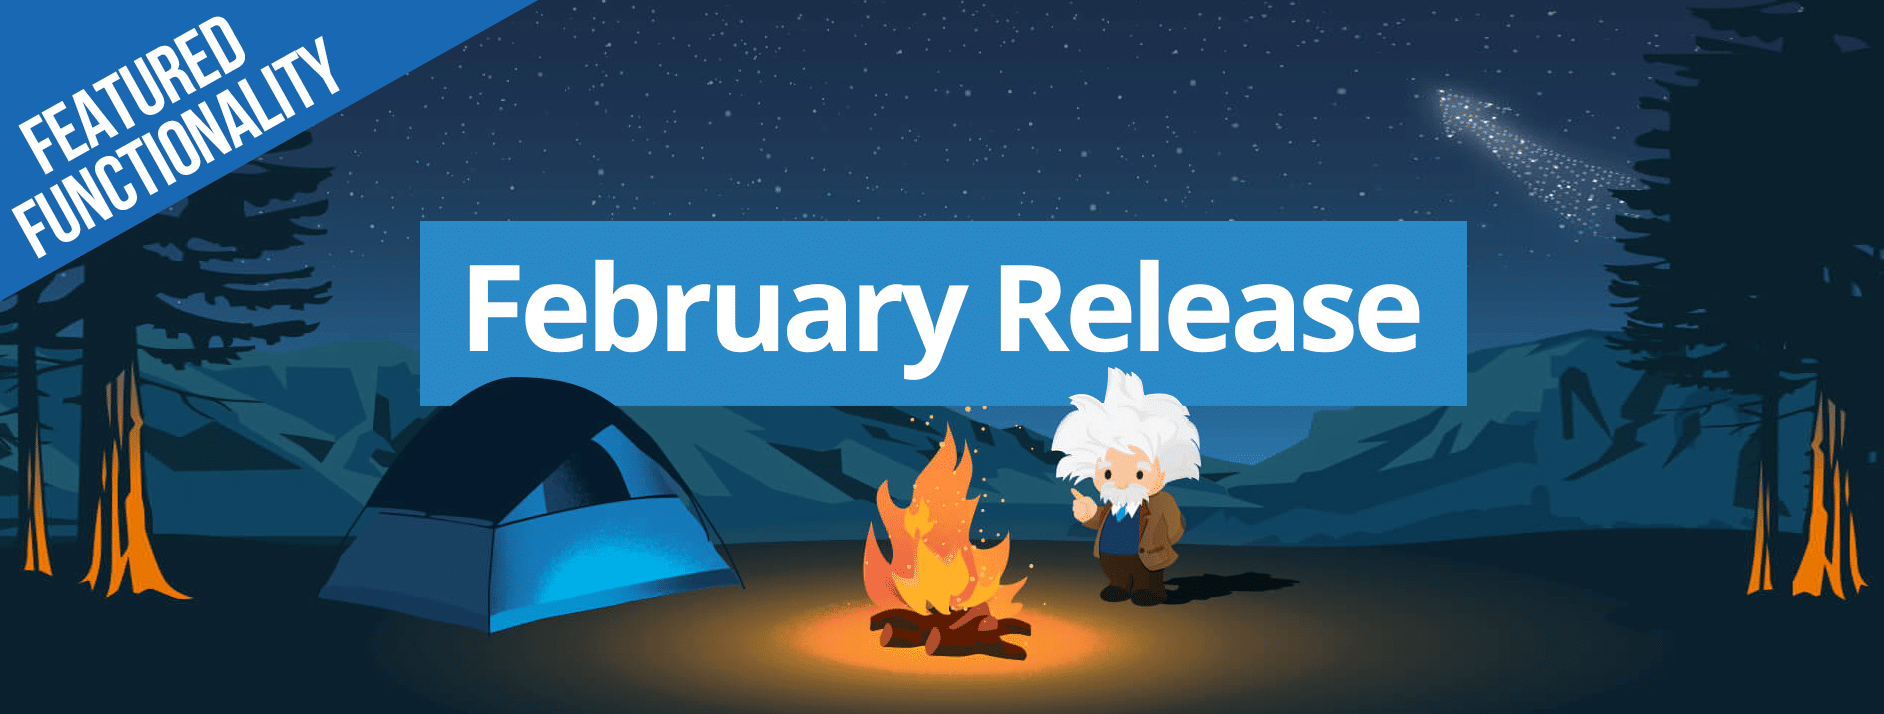 02. Release February 2021